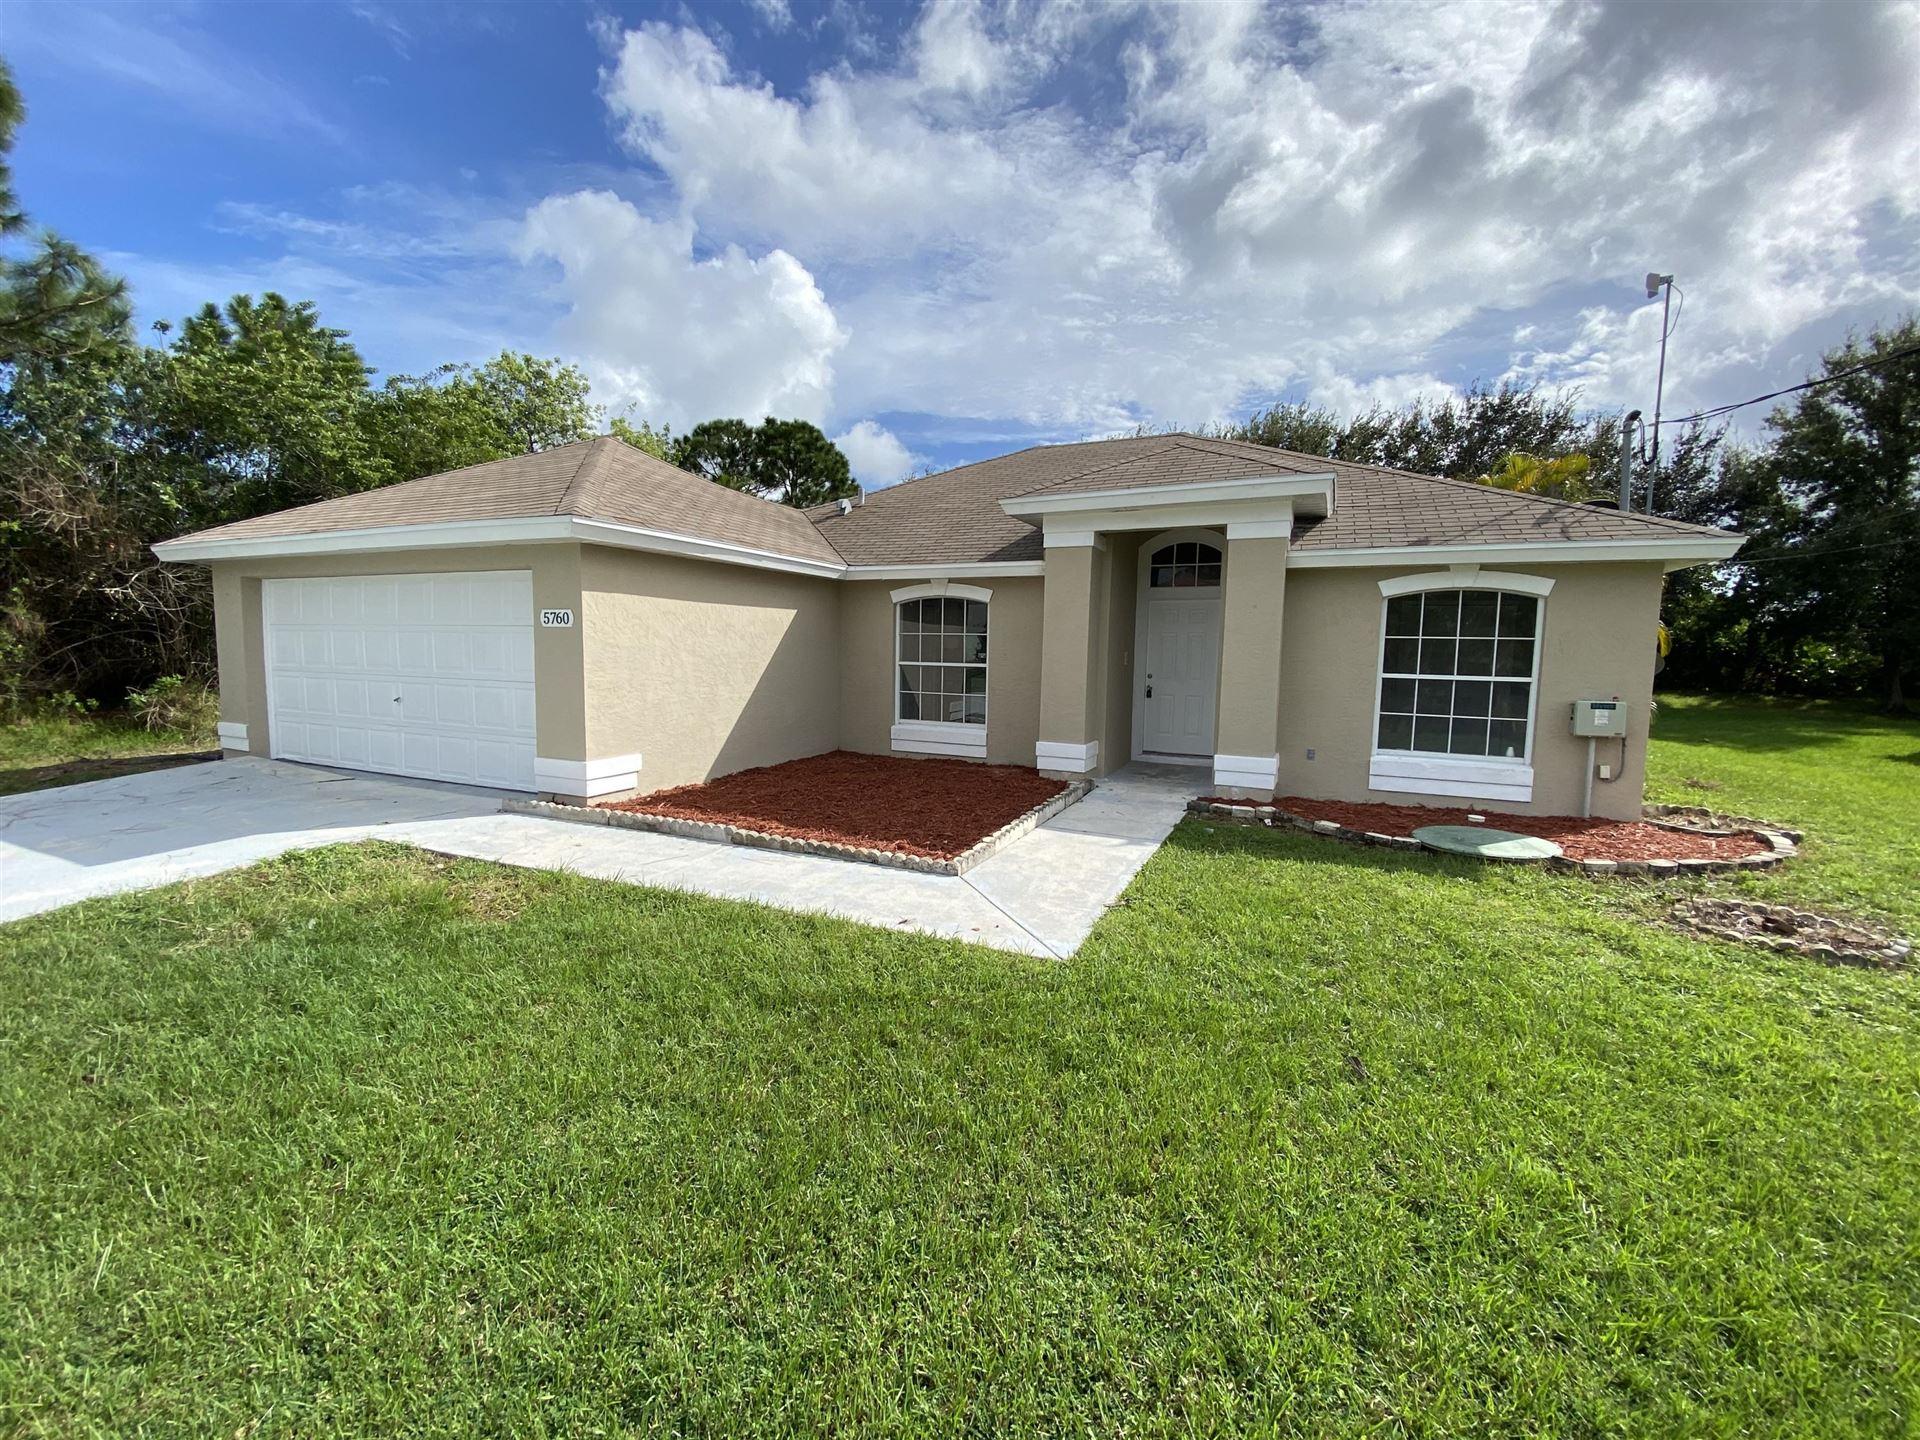 5760 NW Esau Avenue, Port Saint Lucie, FL 34986 - #: RX-10665789